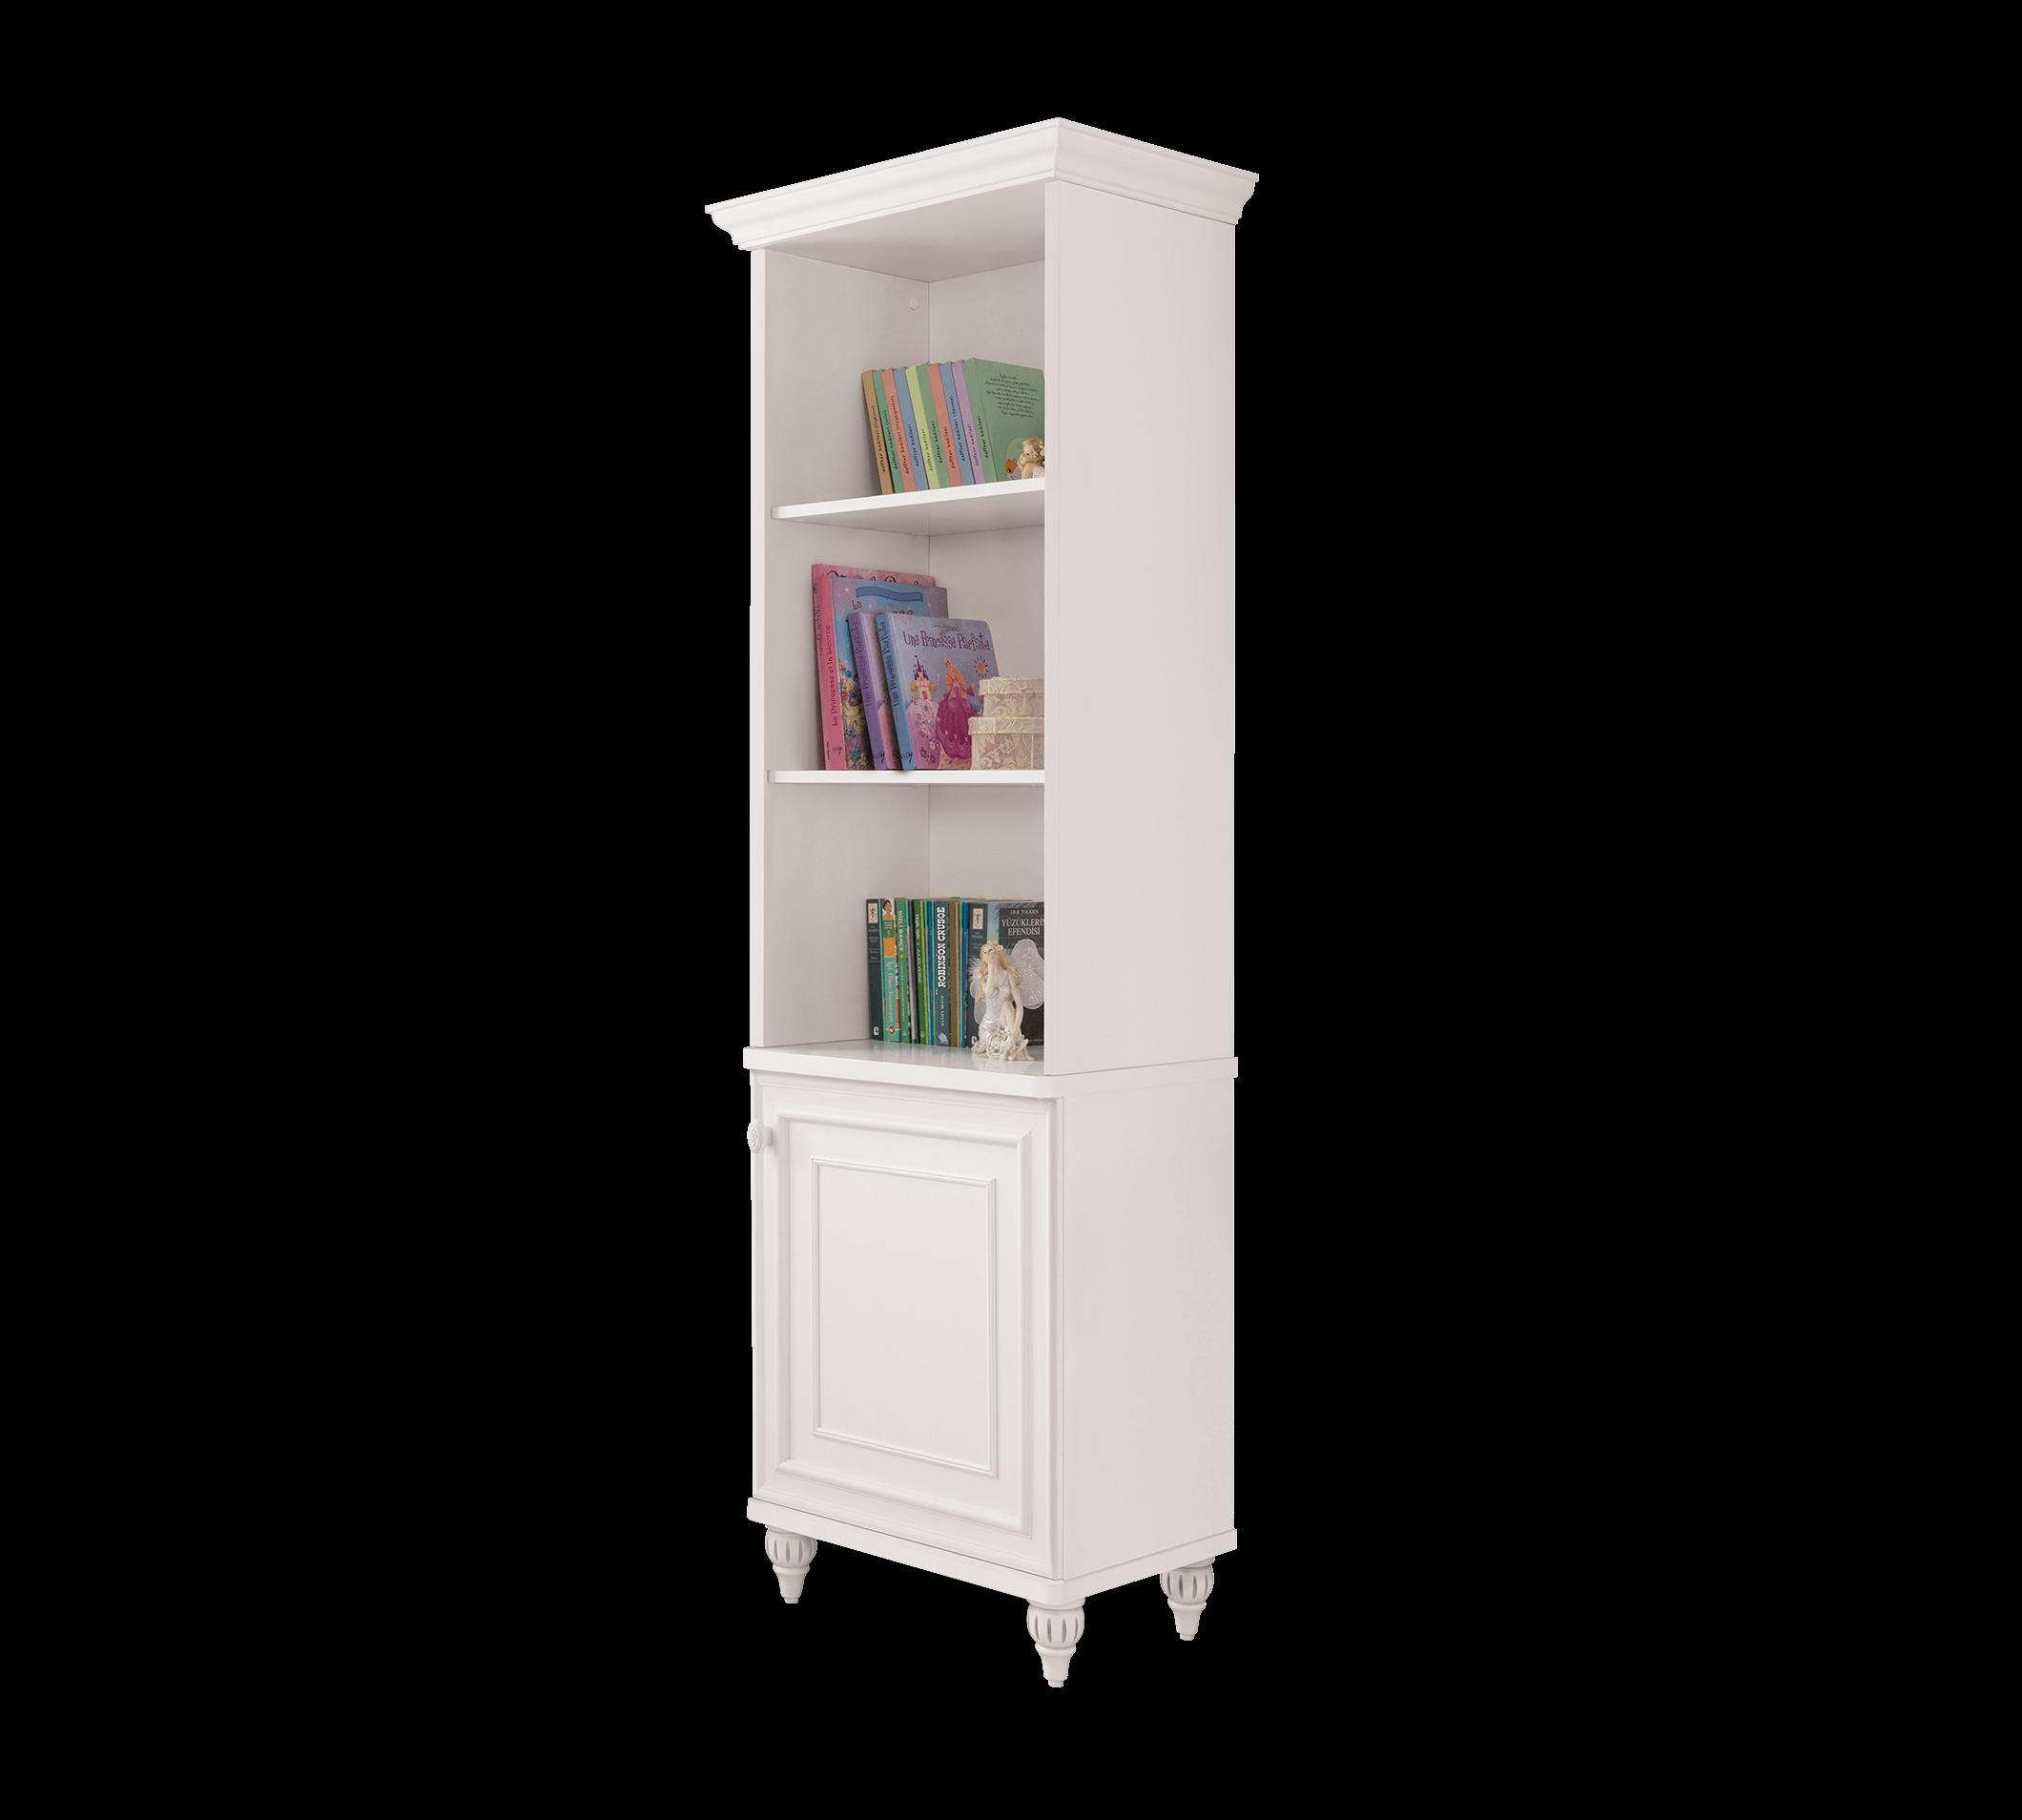 Biblioteca din pal cu 1 usa, pentru copii si tineret Romantica White, l52xA42xH185 cm somproduct.ro